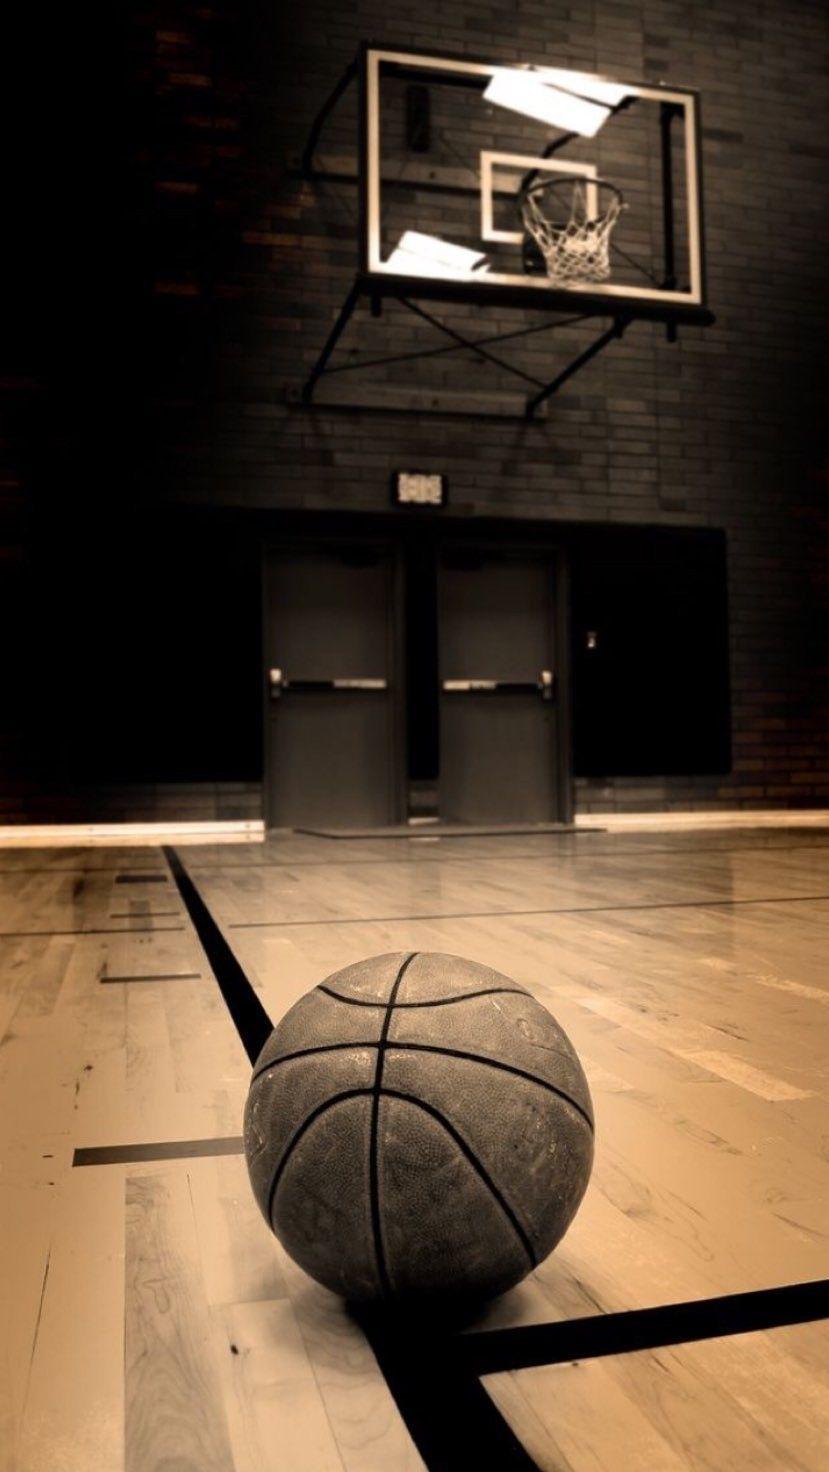 Pin By Yohith Boopathi On Michael Jordan Basketball Wallpaper Sports Basketball Basketball Background